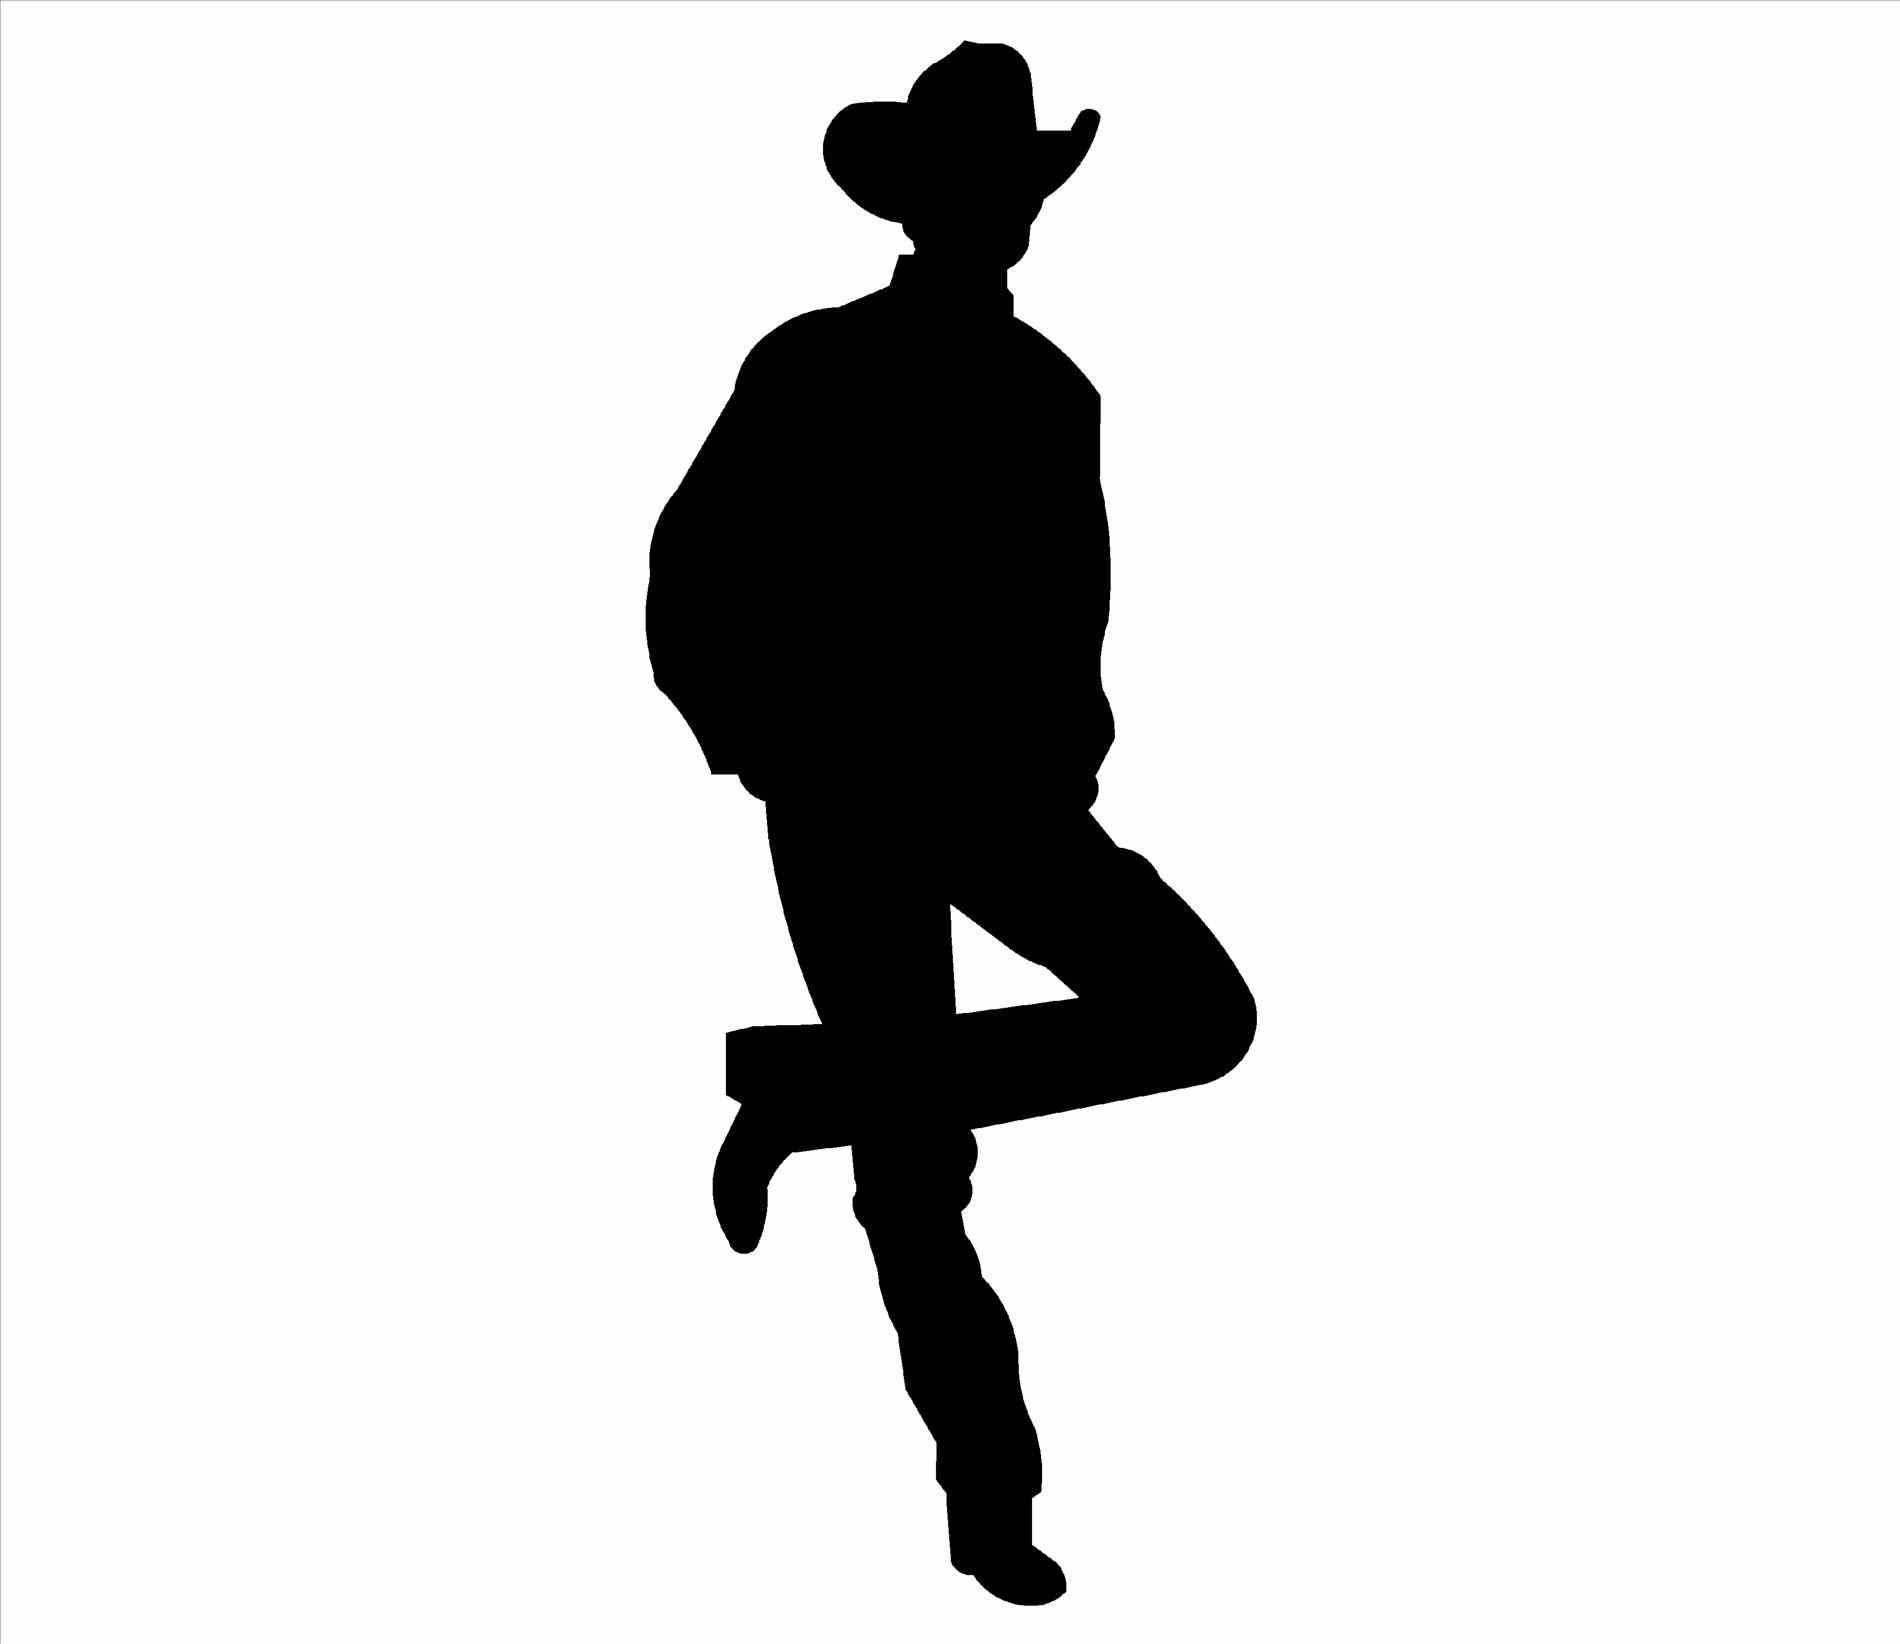 1900x1644 Or Card Little Cowboy Boot Silhouette Clip Art Child Die Cut